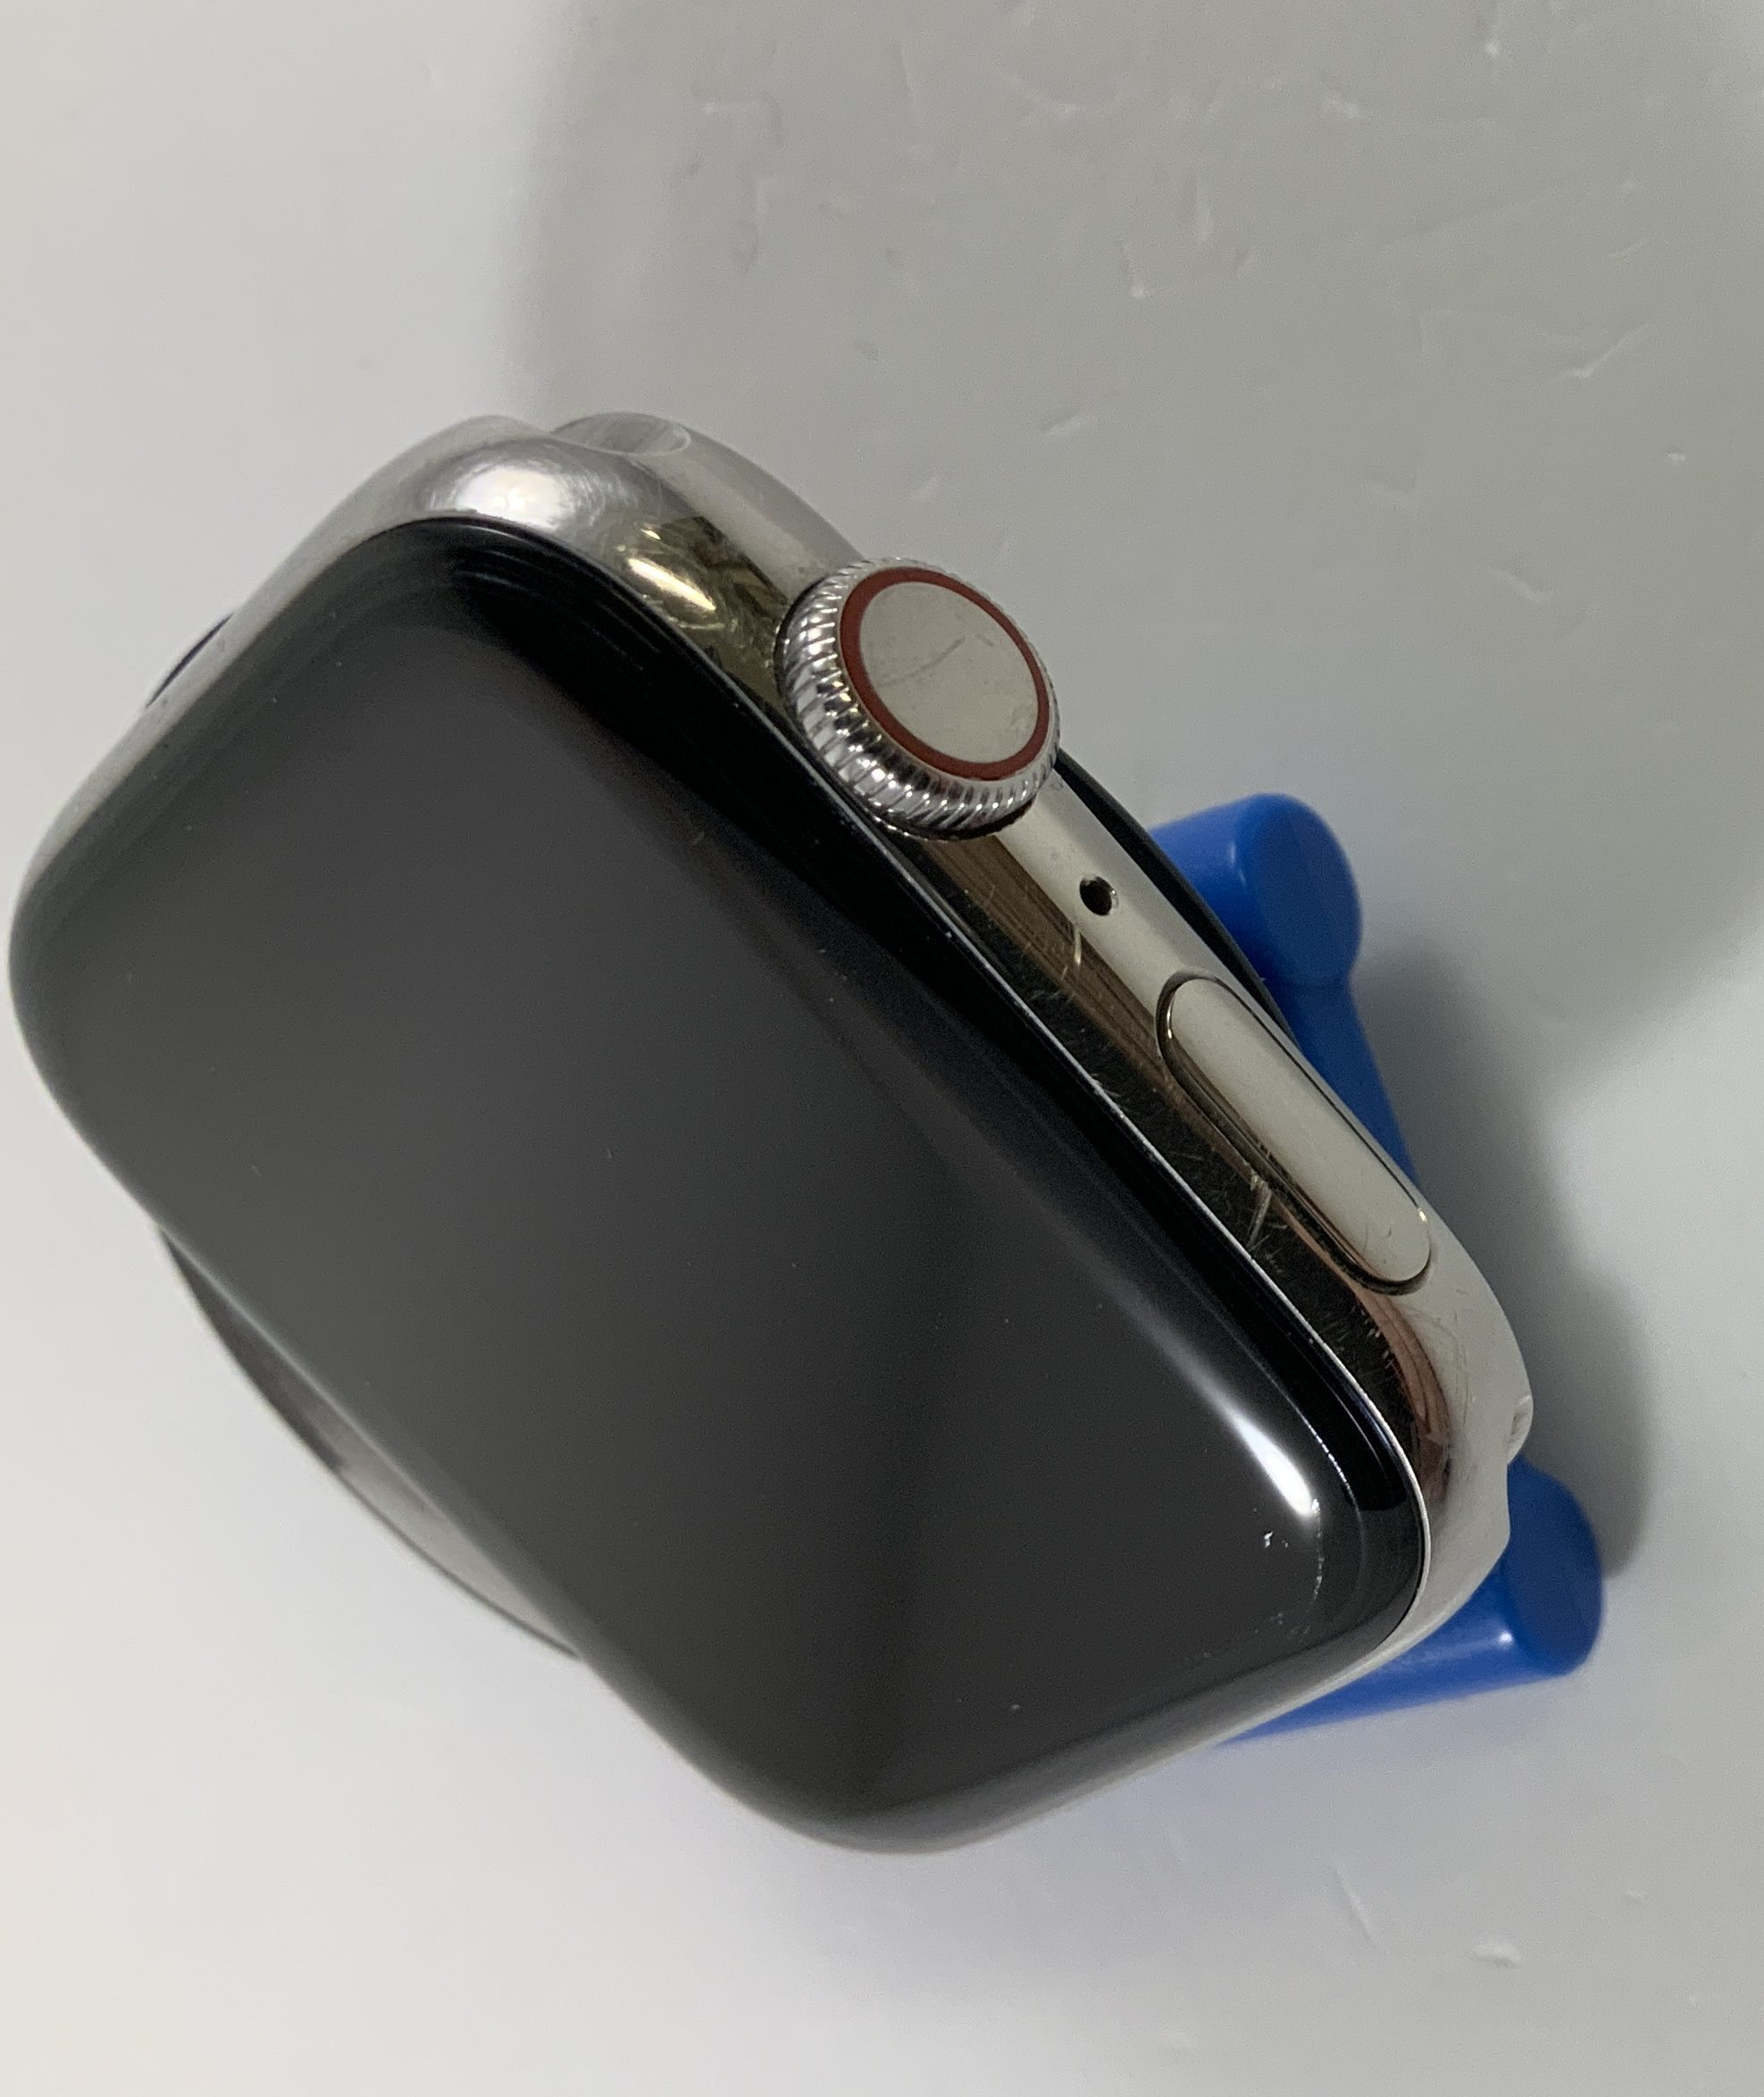 Watch Series 5 Steel Cellular (44mm), Silver, imagen 3